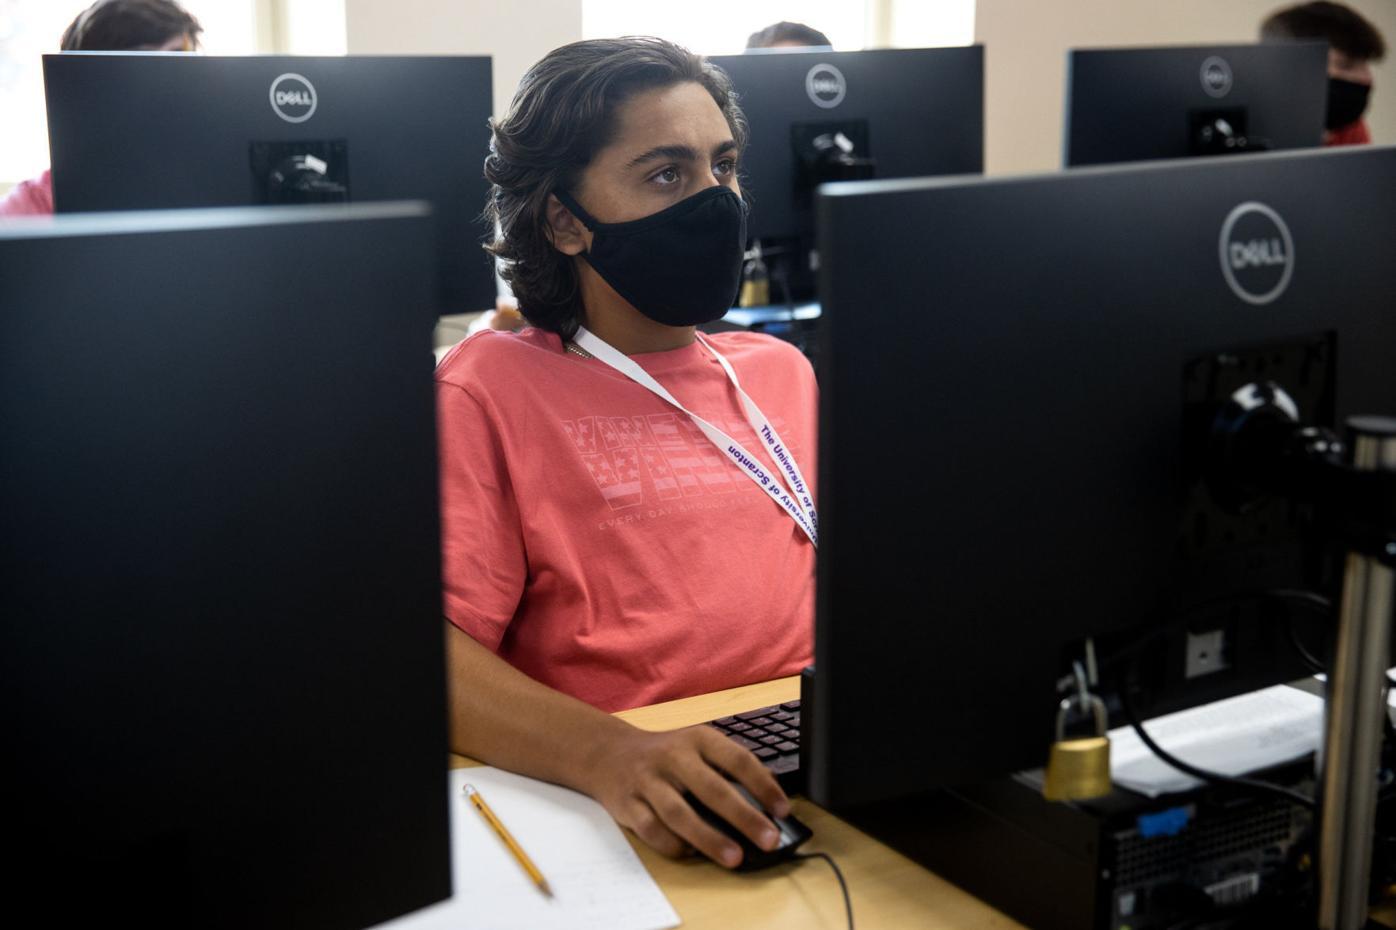 University of Scranton cyber crime investigation camp